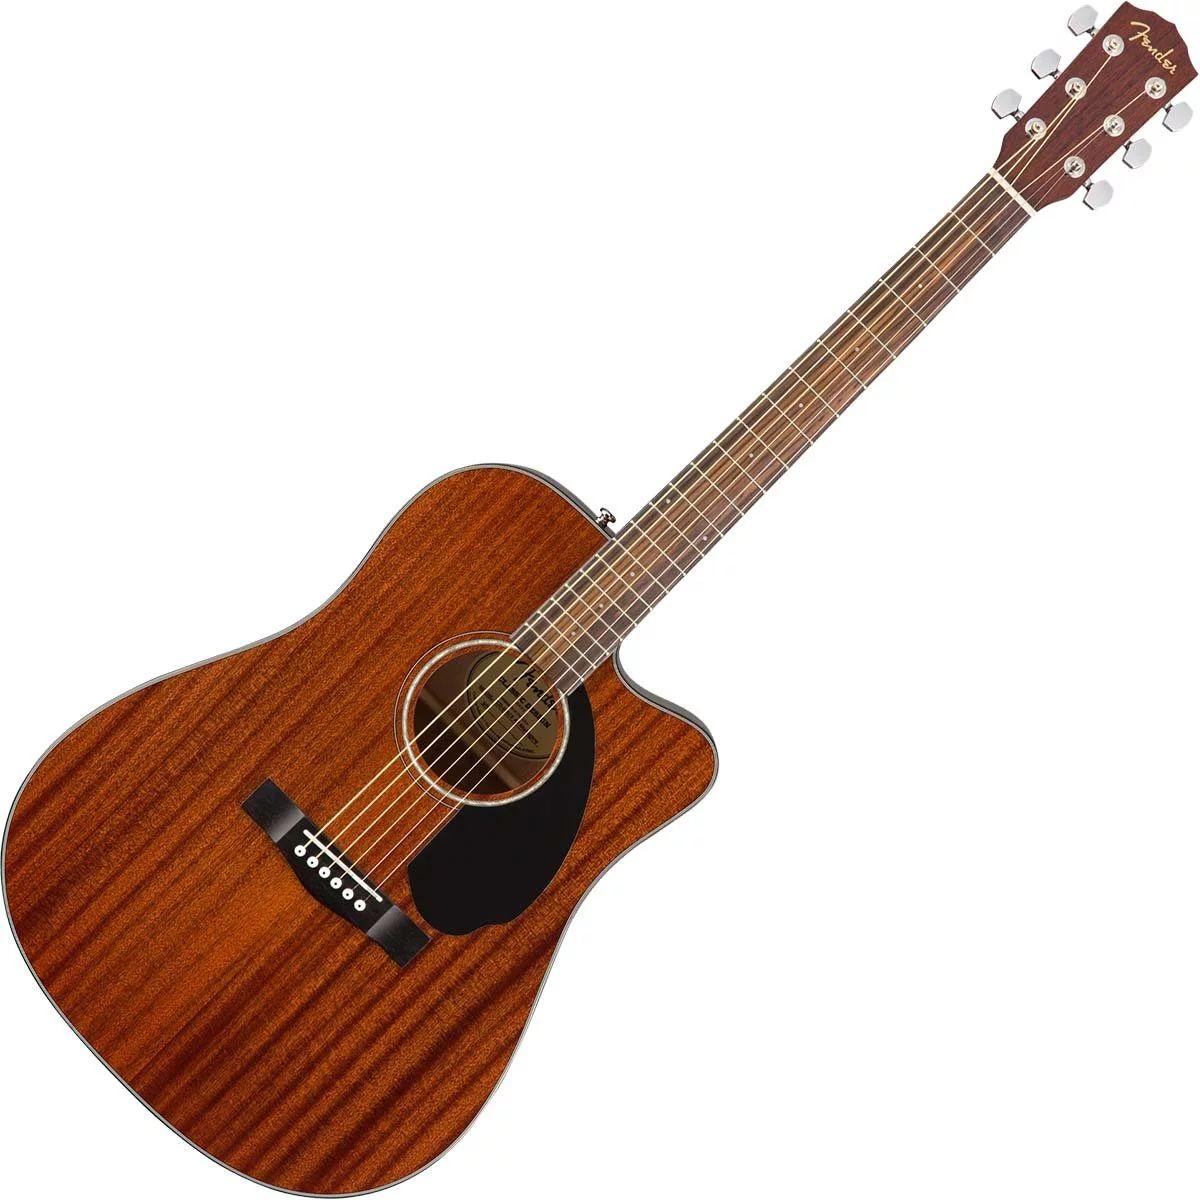 Fender cd-60sce all-mahogany electro acoustic guitar £179.10 @ Dawsons Music